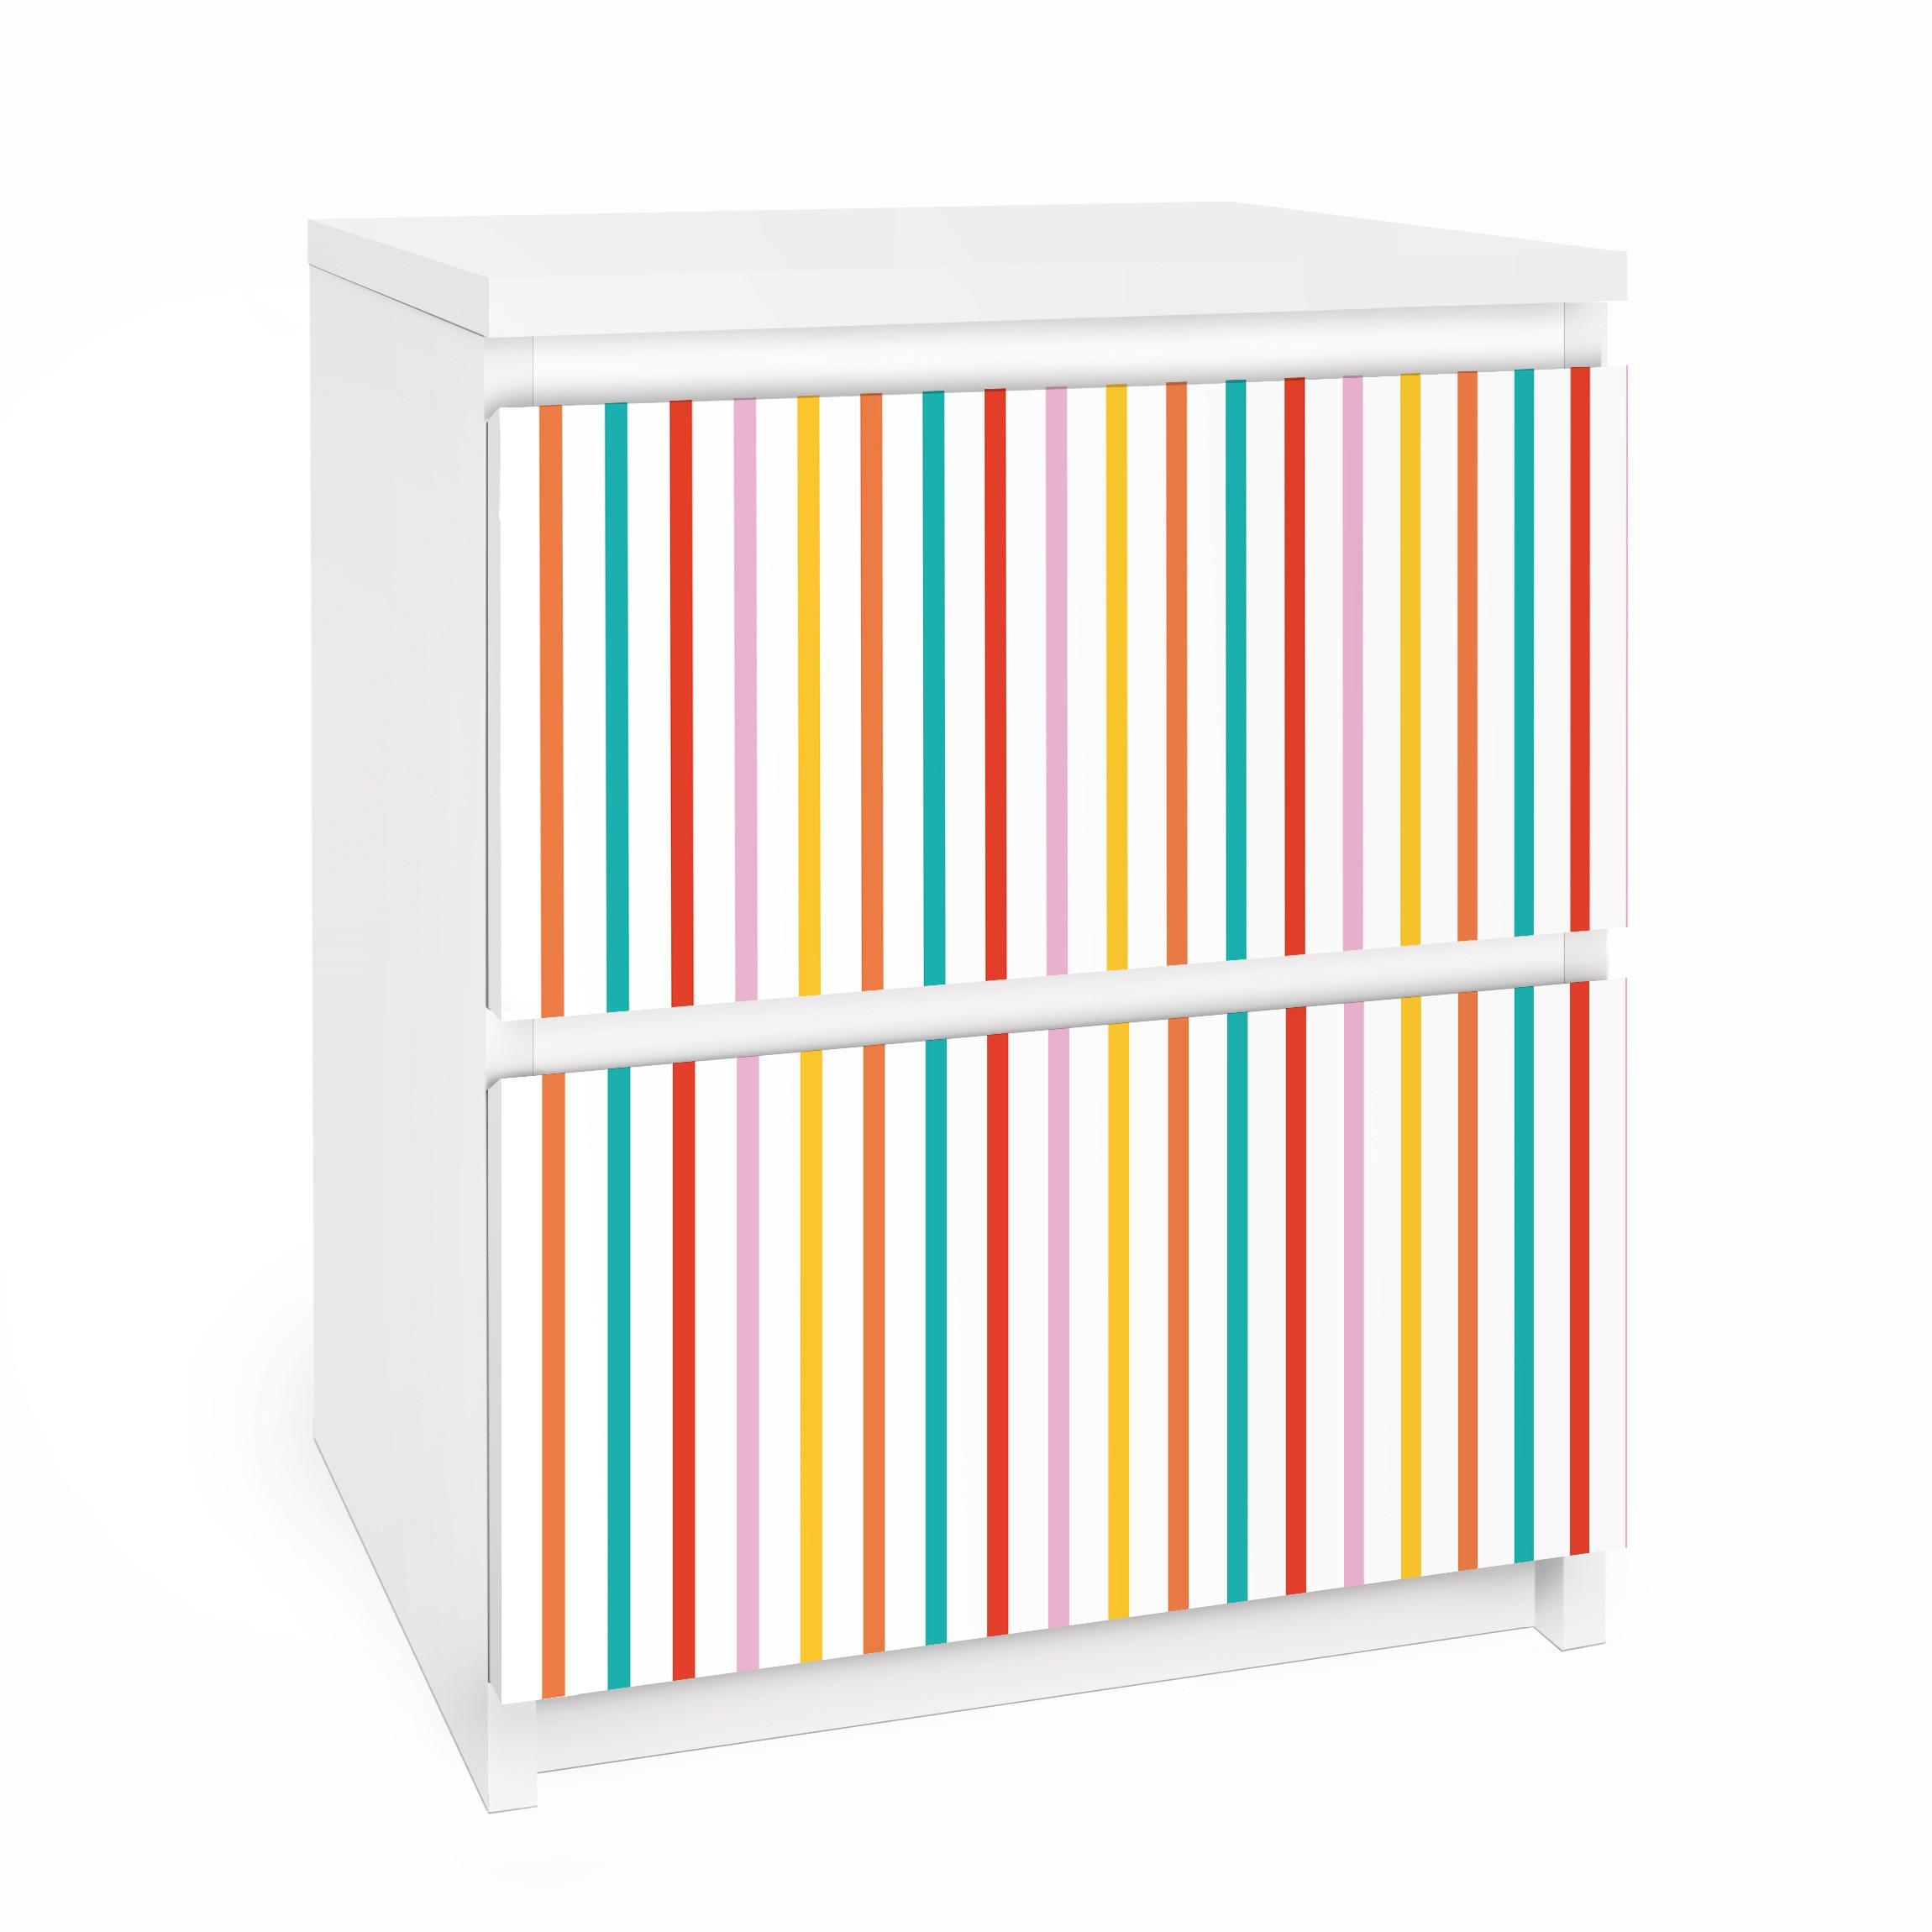 Carta adesiva per mobili ikea malm cassettiera 2xcassetti no ul750 stripes - Carta adesiva per mobili ikea ...